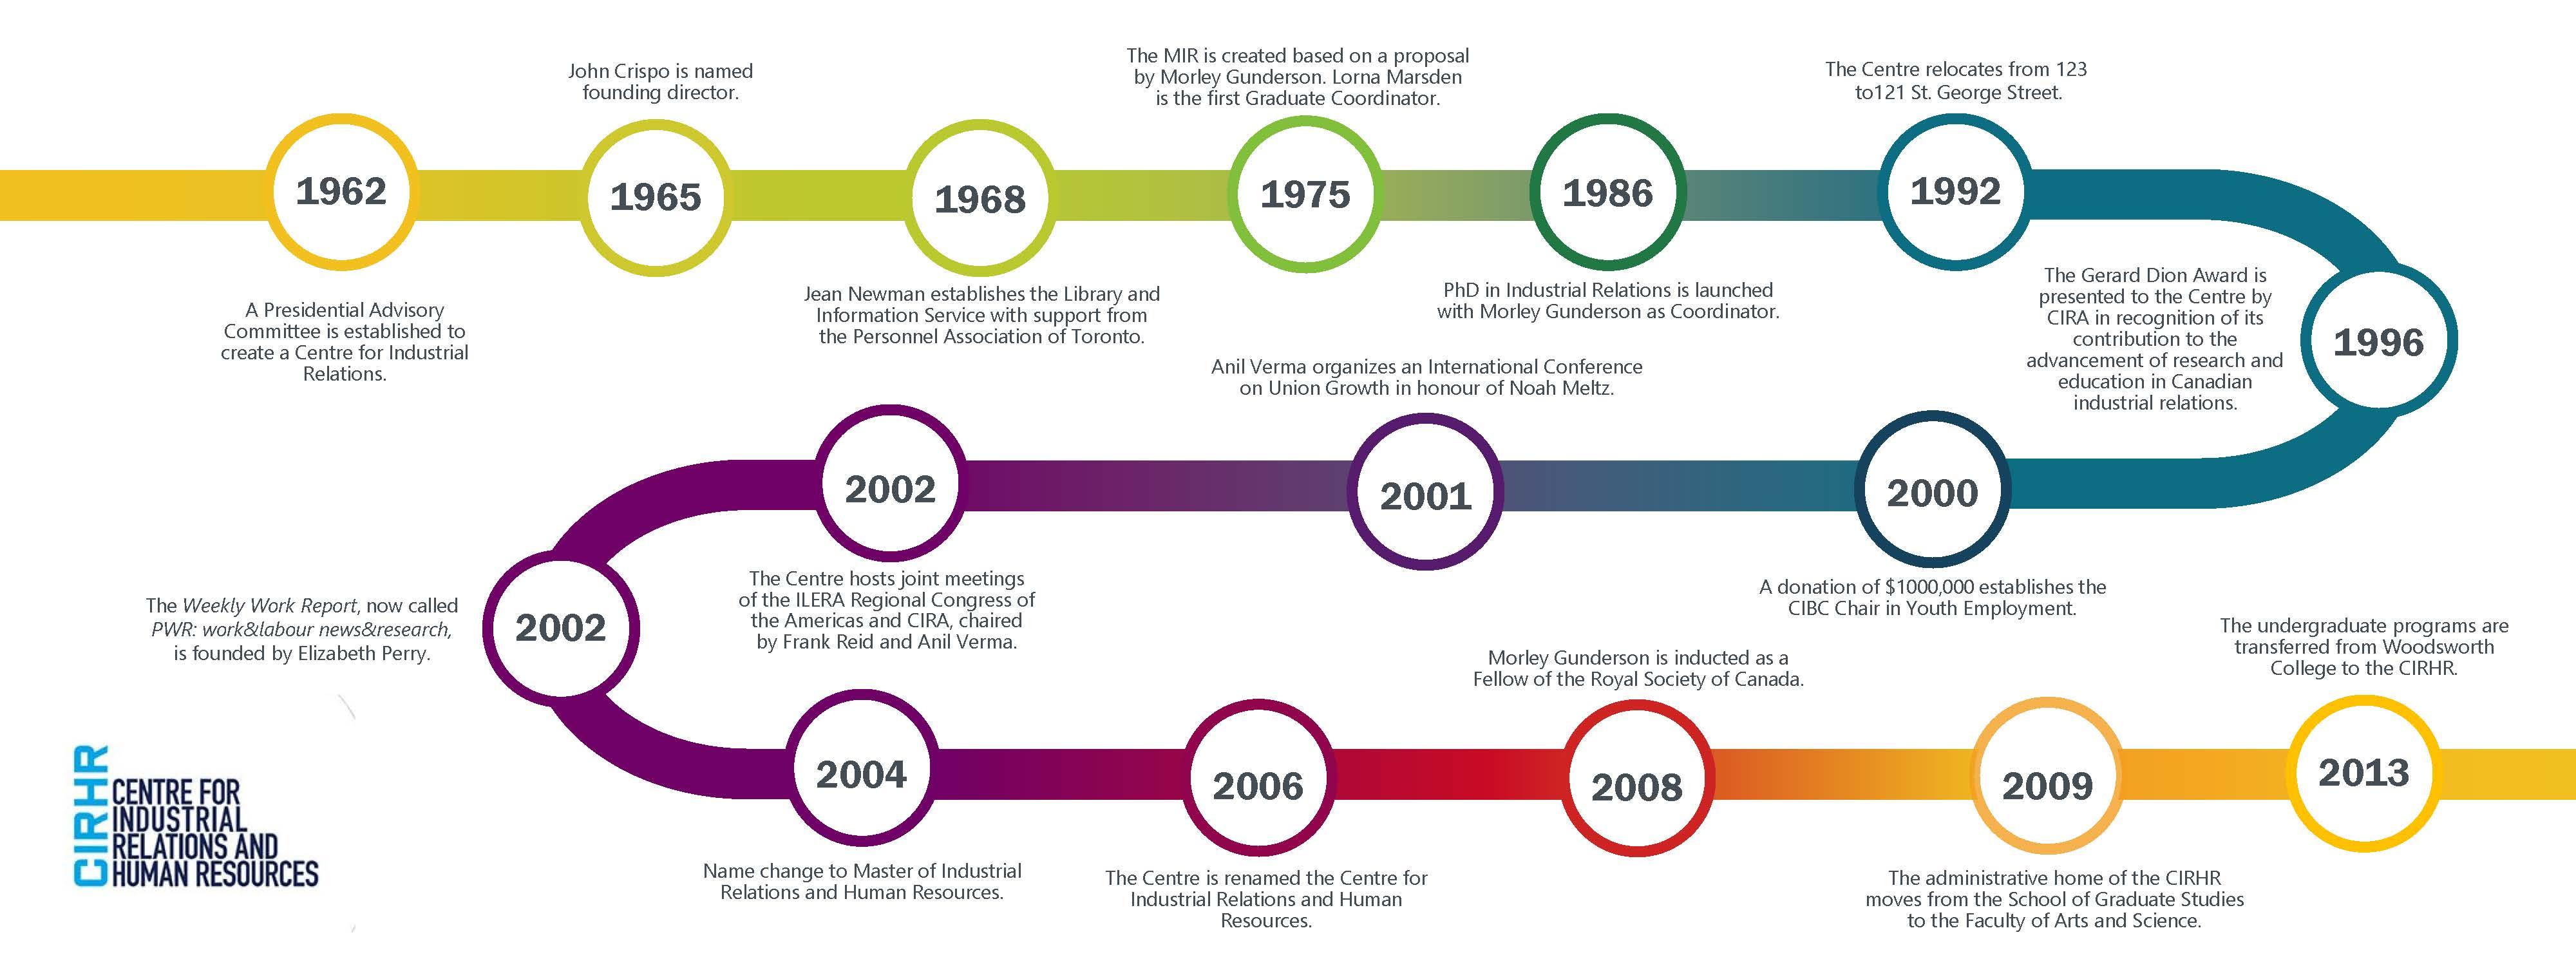 CIRHR milestones text below